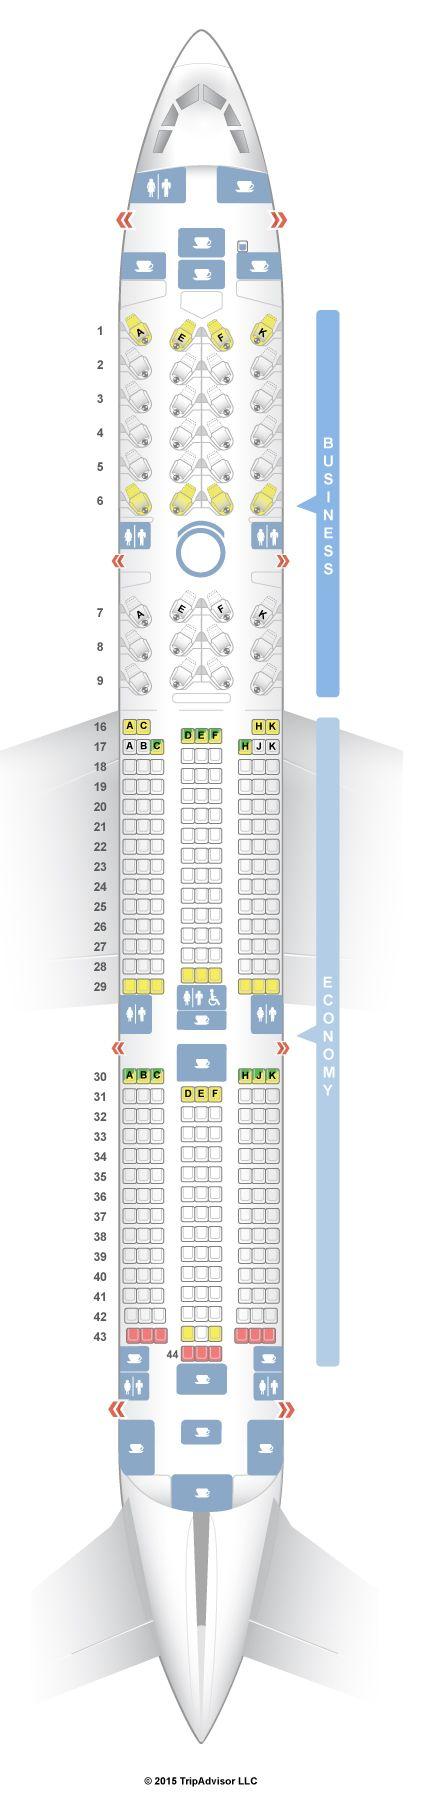 Airbus A330-200 (332)